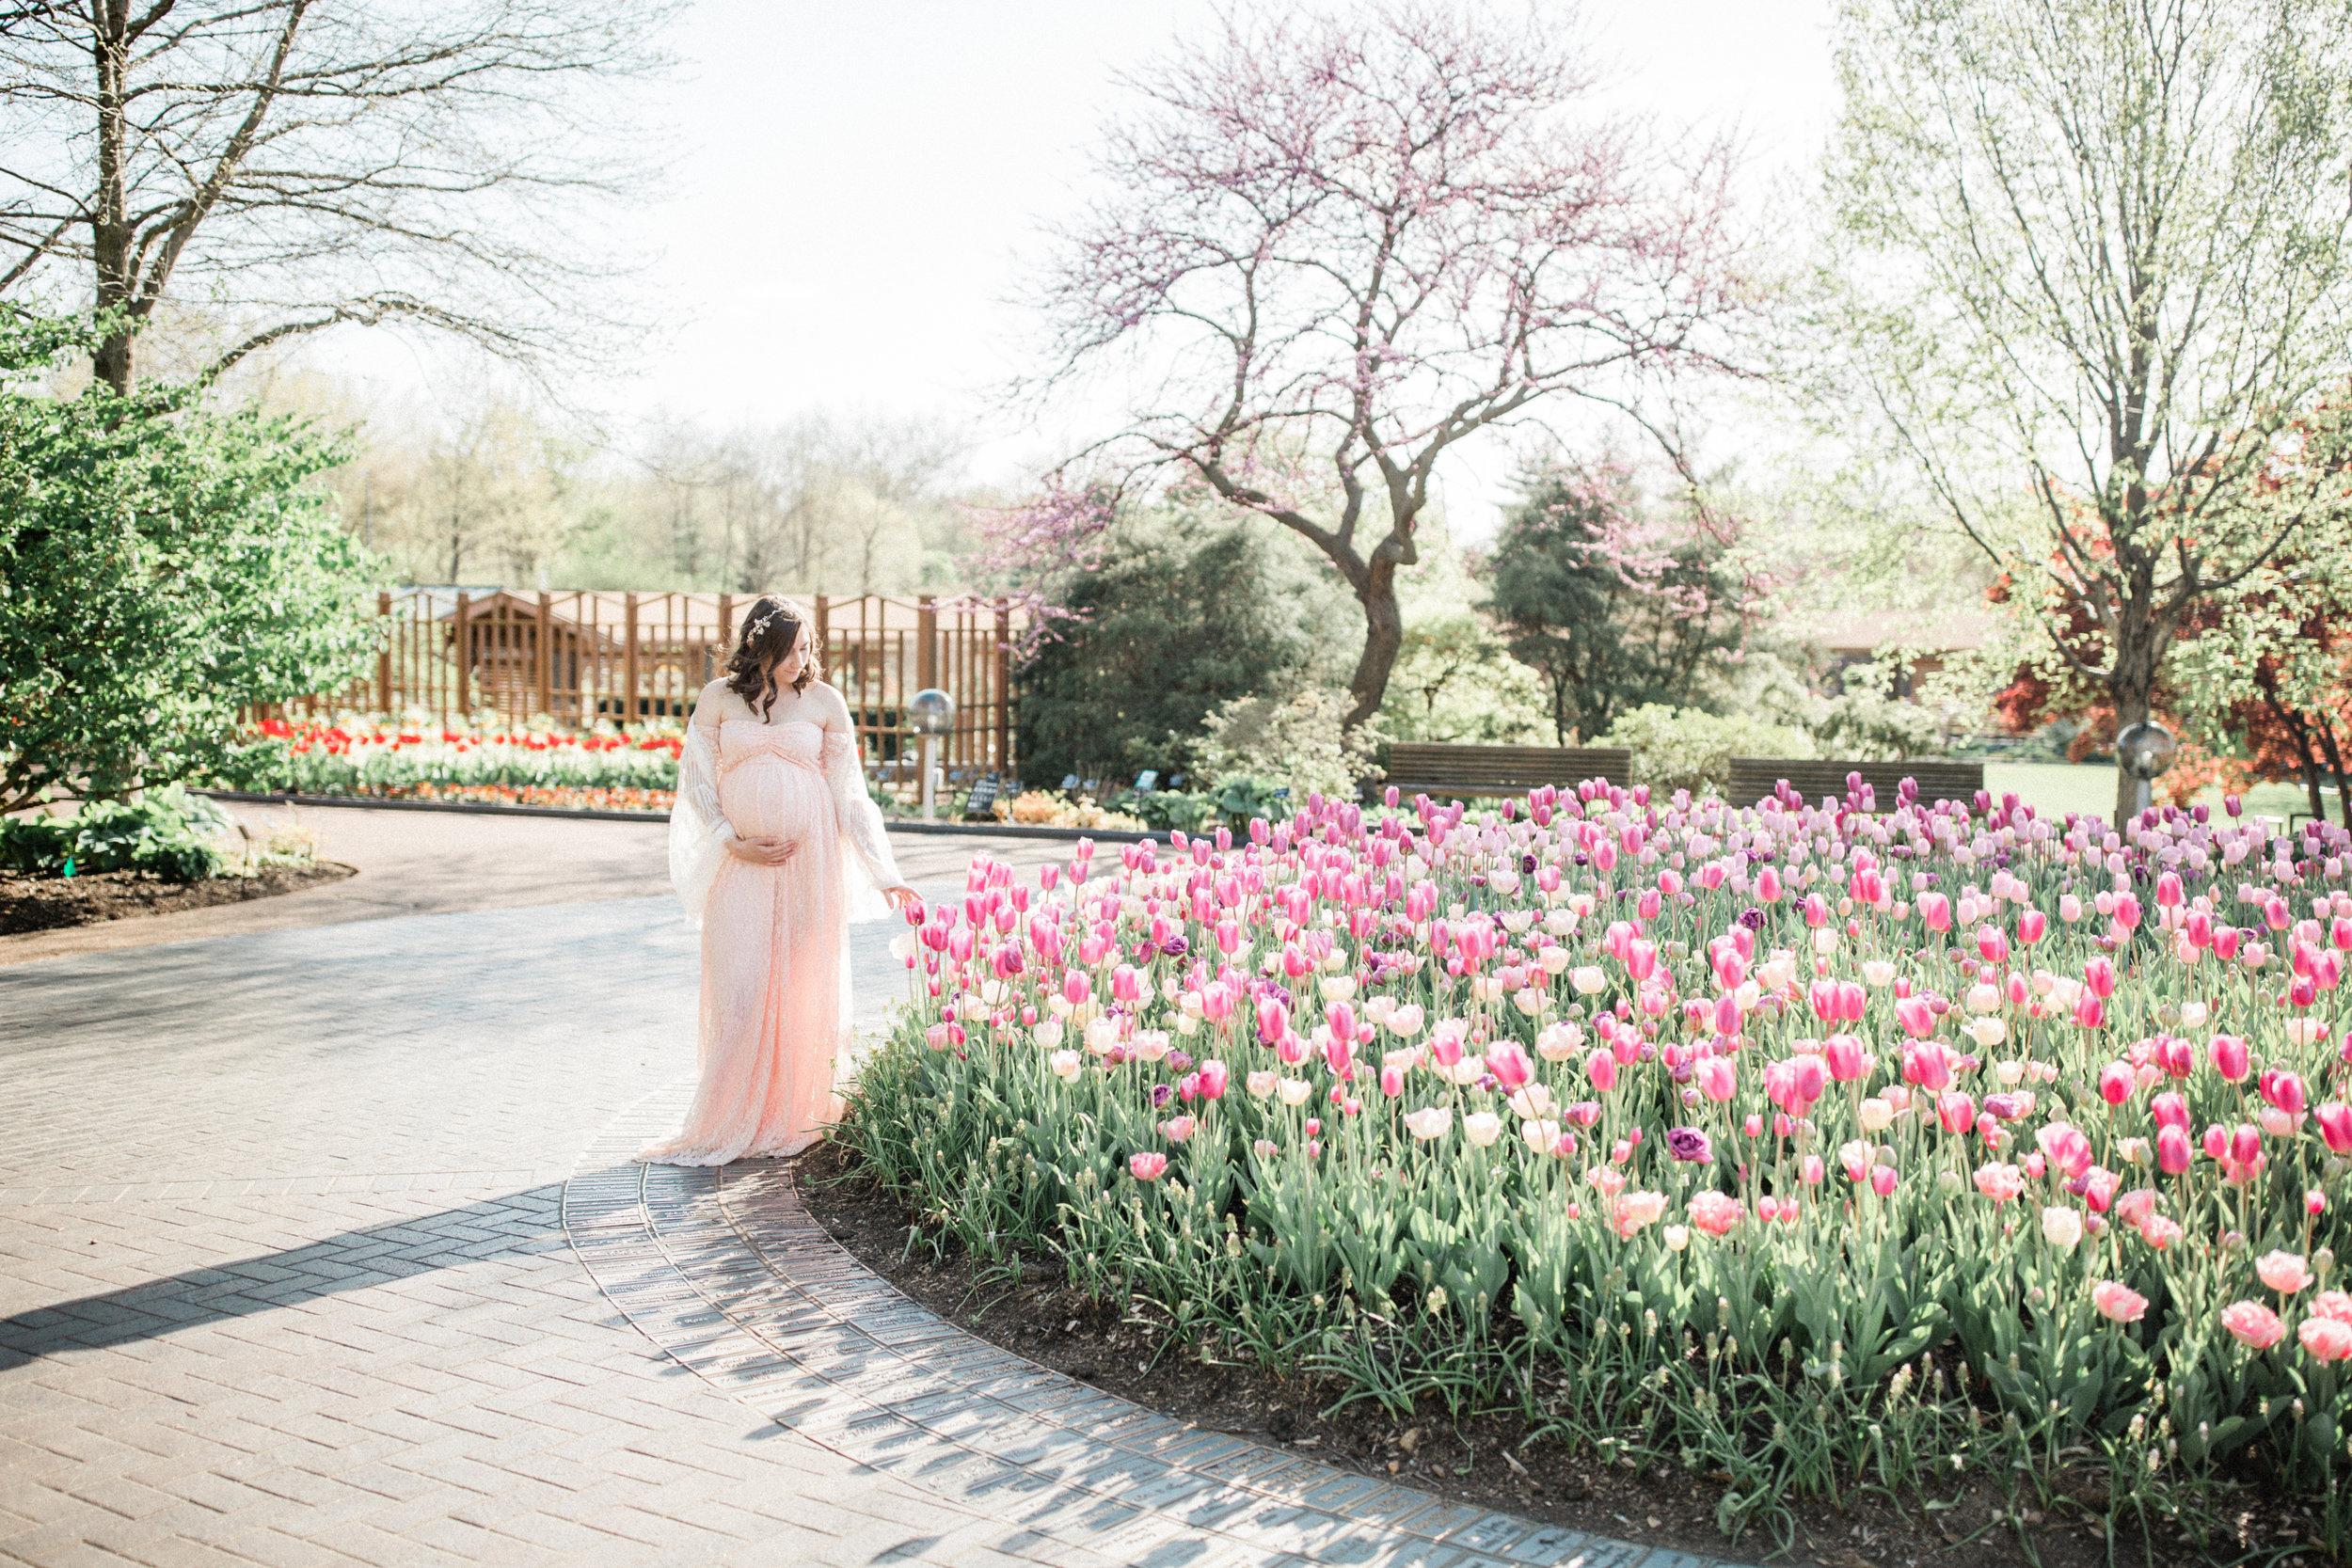 dorothy-louise-photography-Missouri-botanical-garden-maternity-8586.jpg